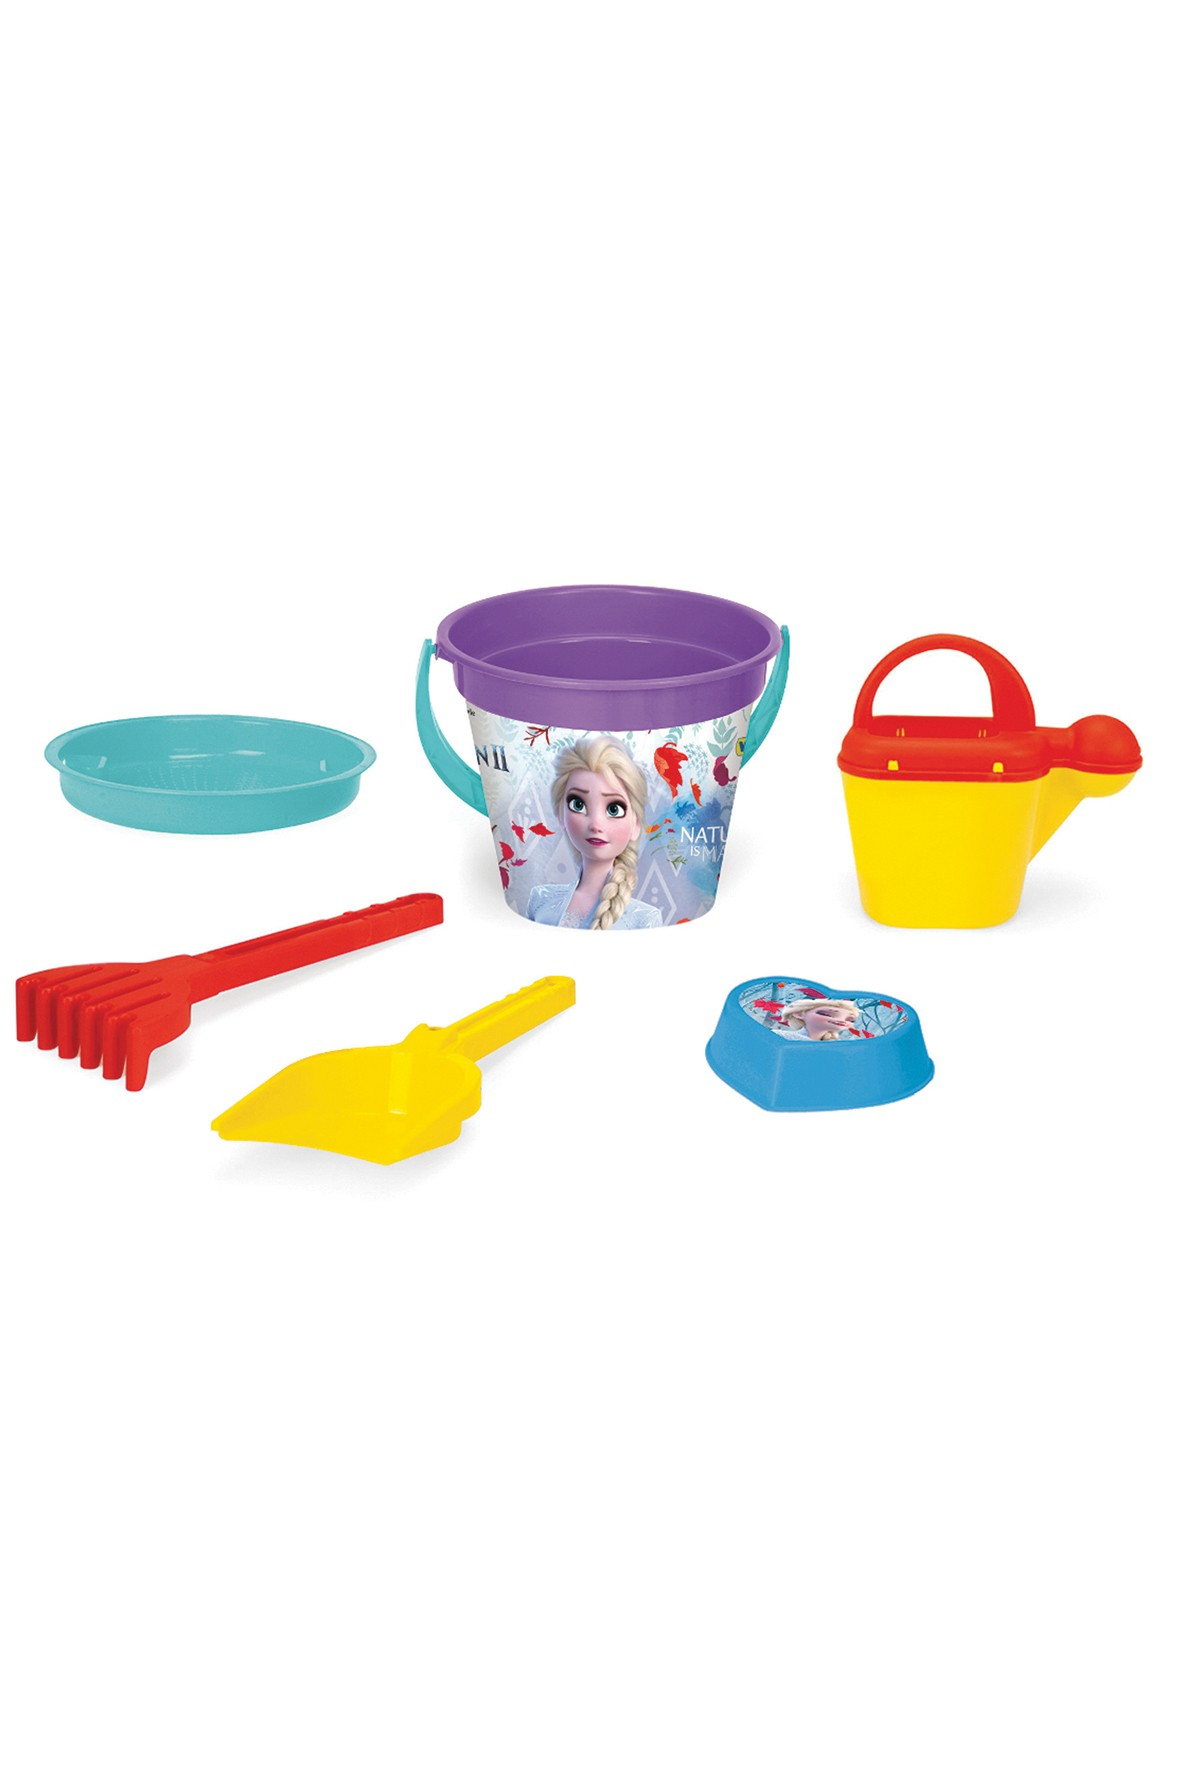 Frozen komplet zabawek do piasku 6 elementów